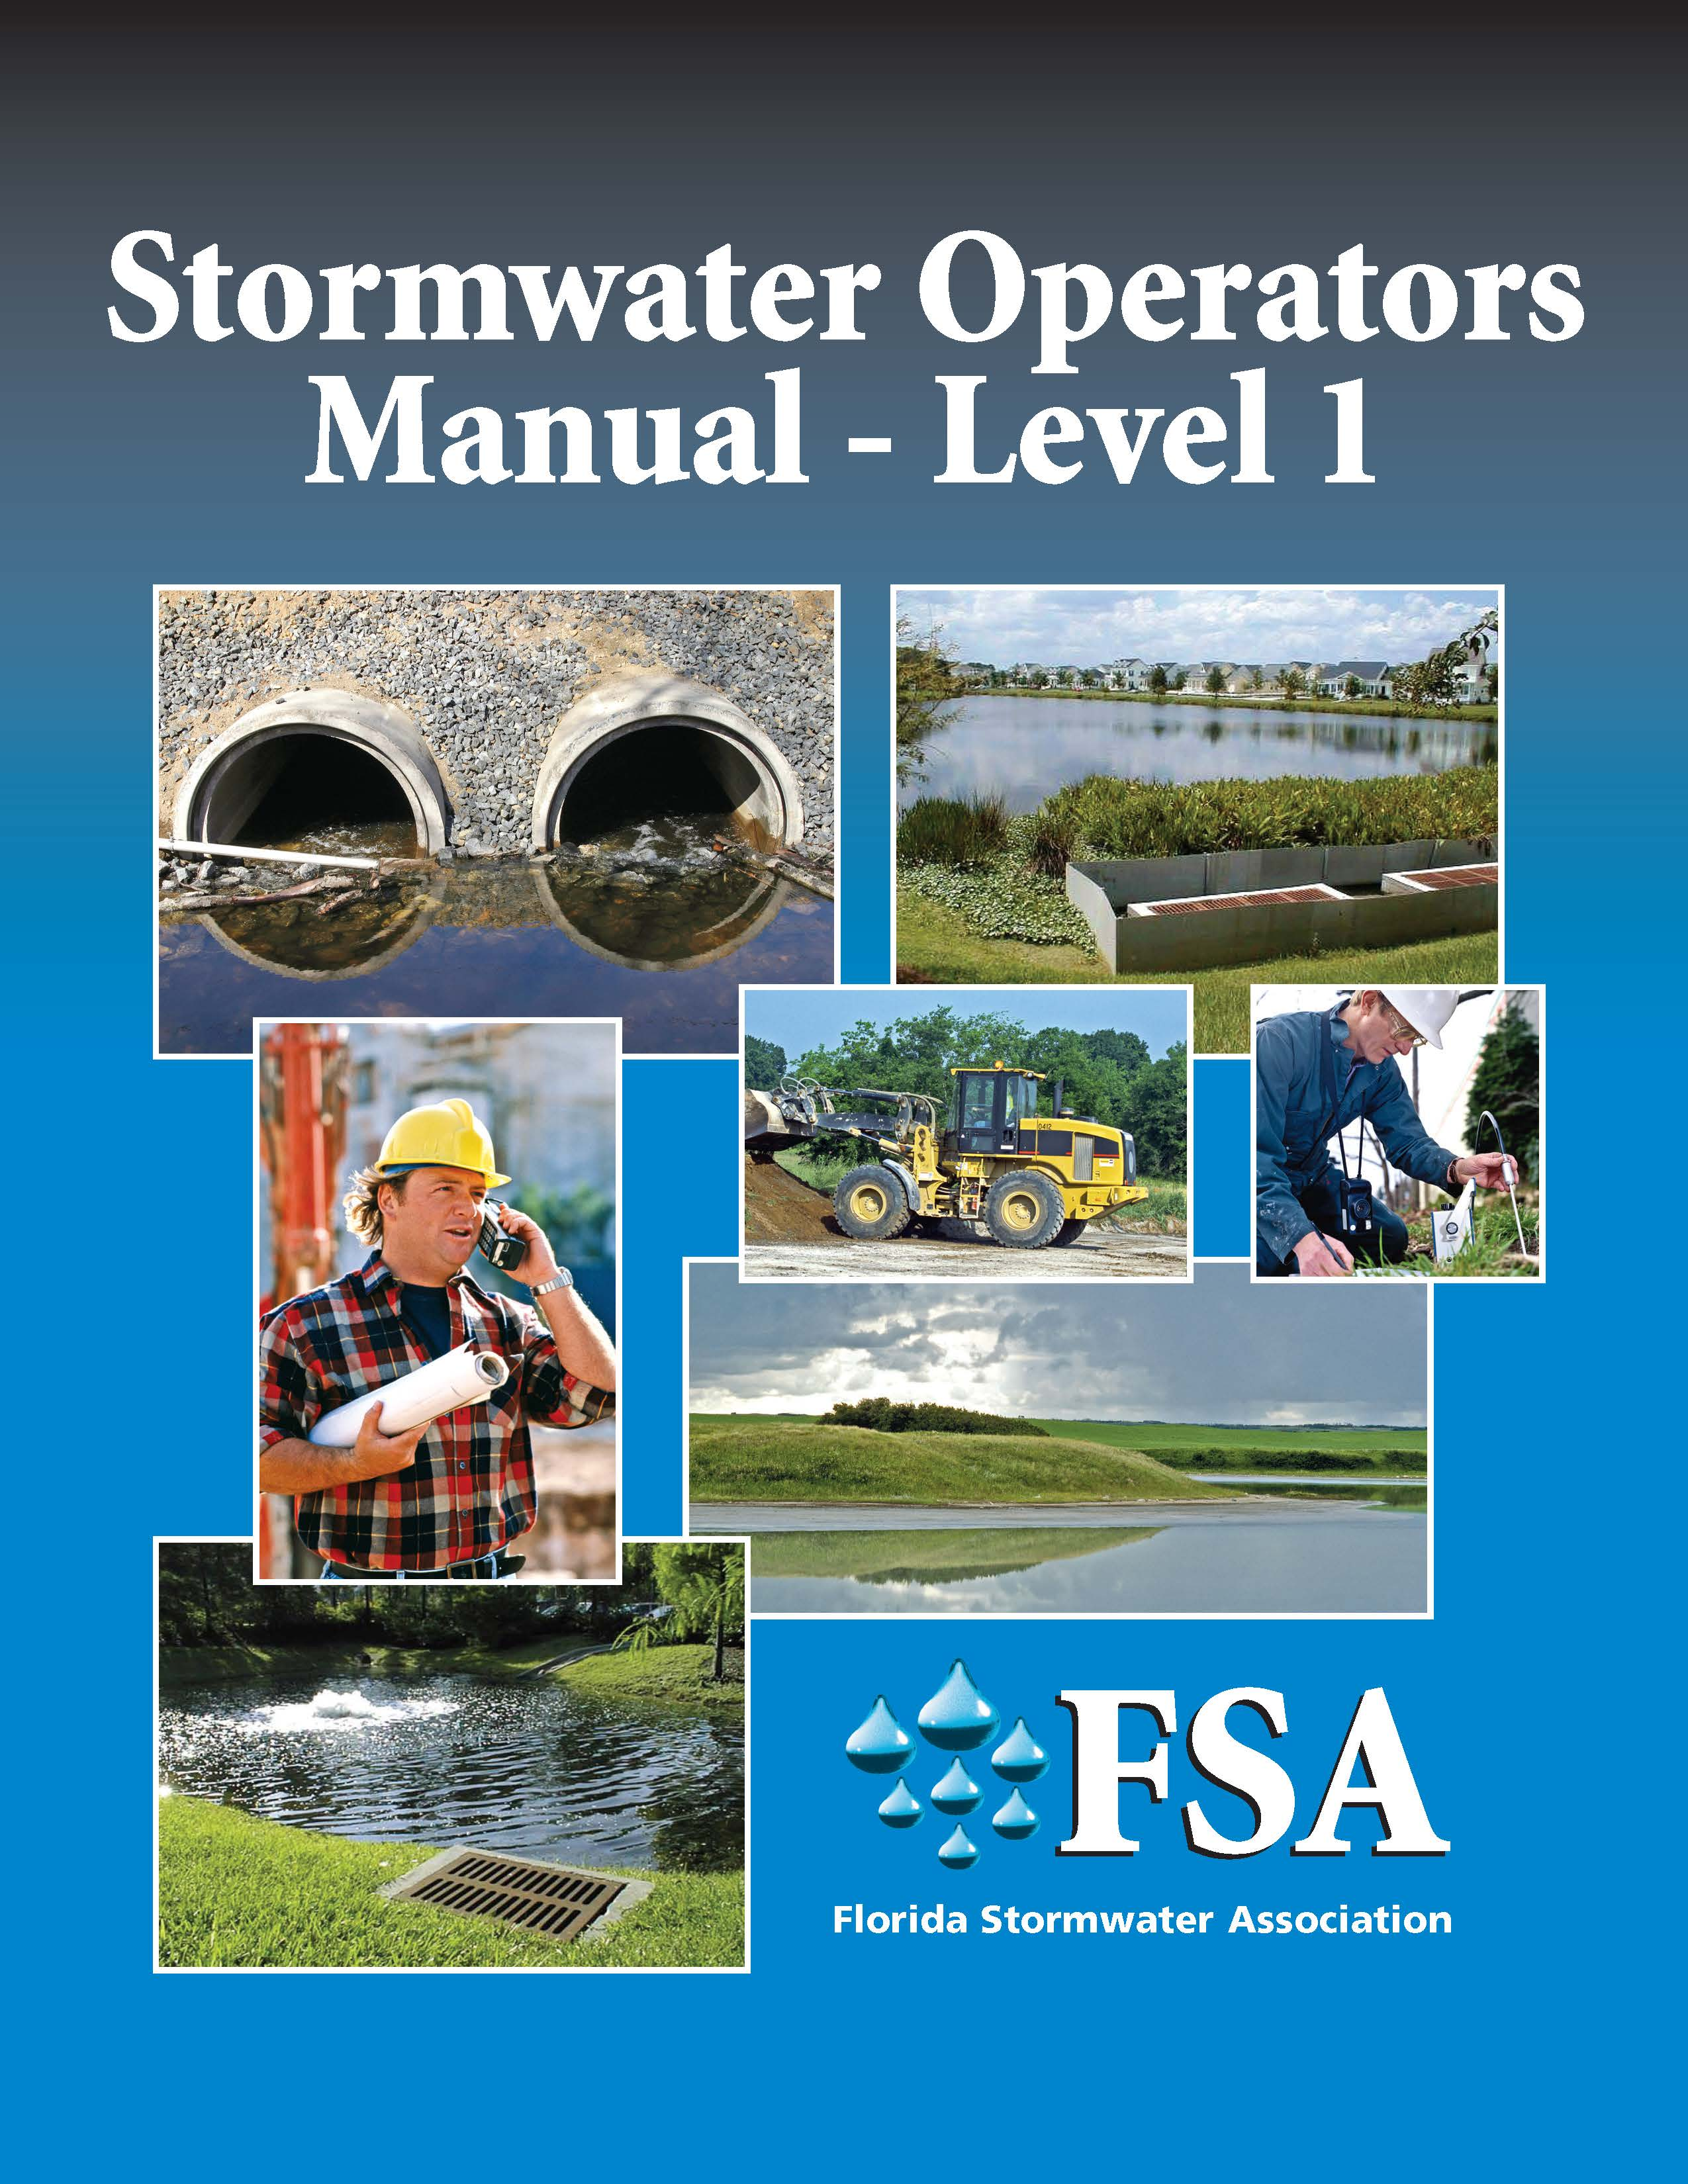 Training center fsa operator certification level 1 xflitez Image collections